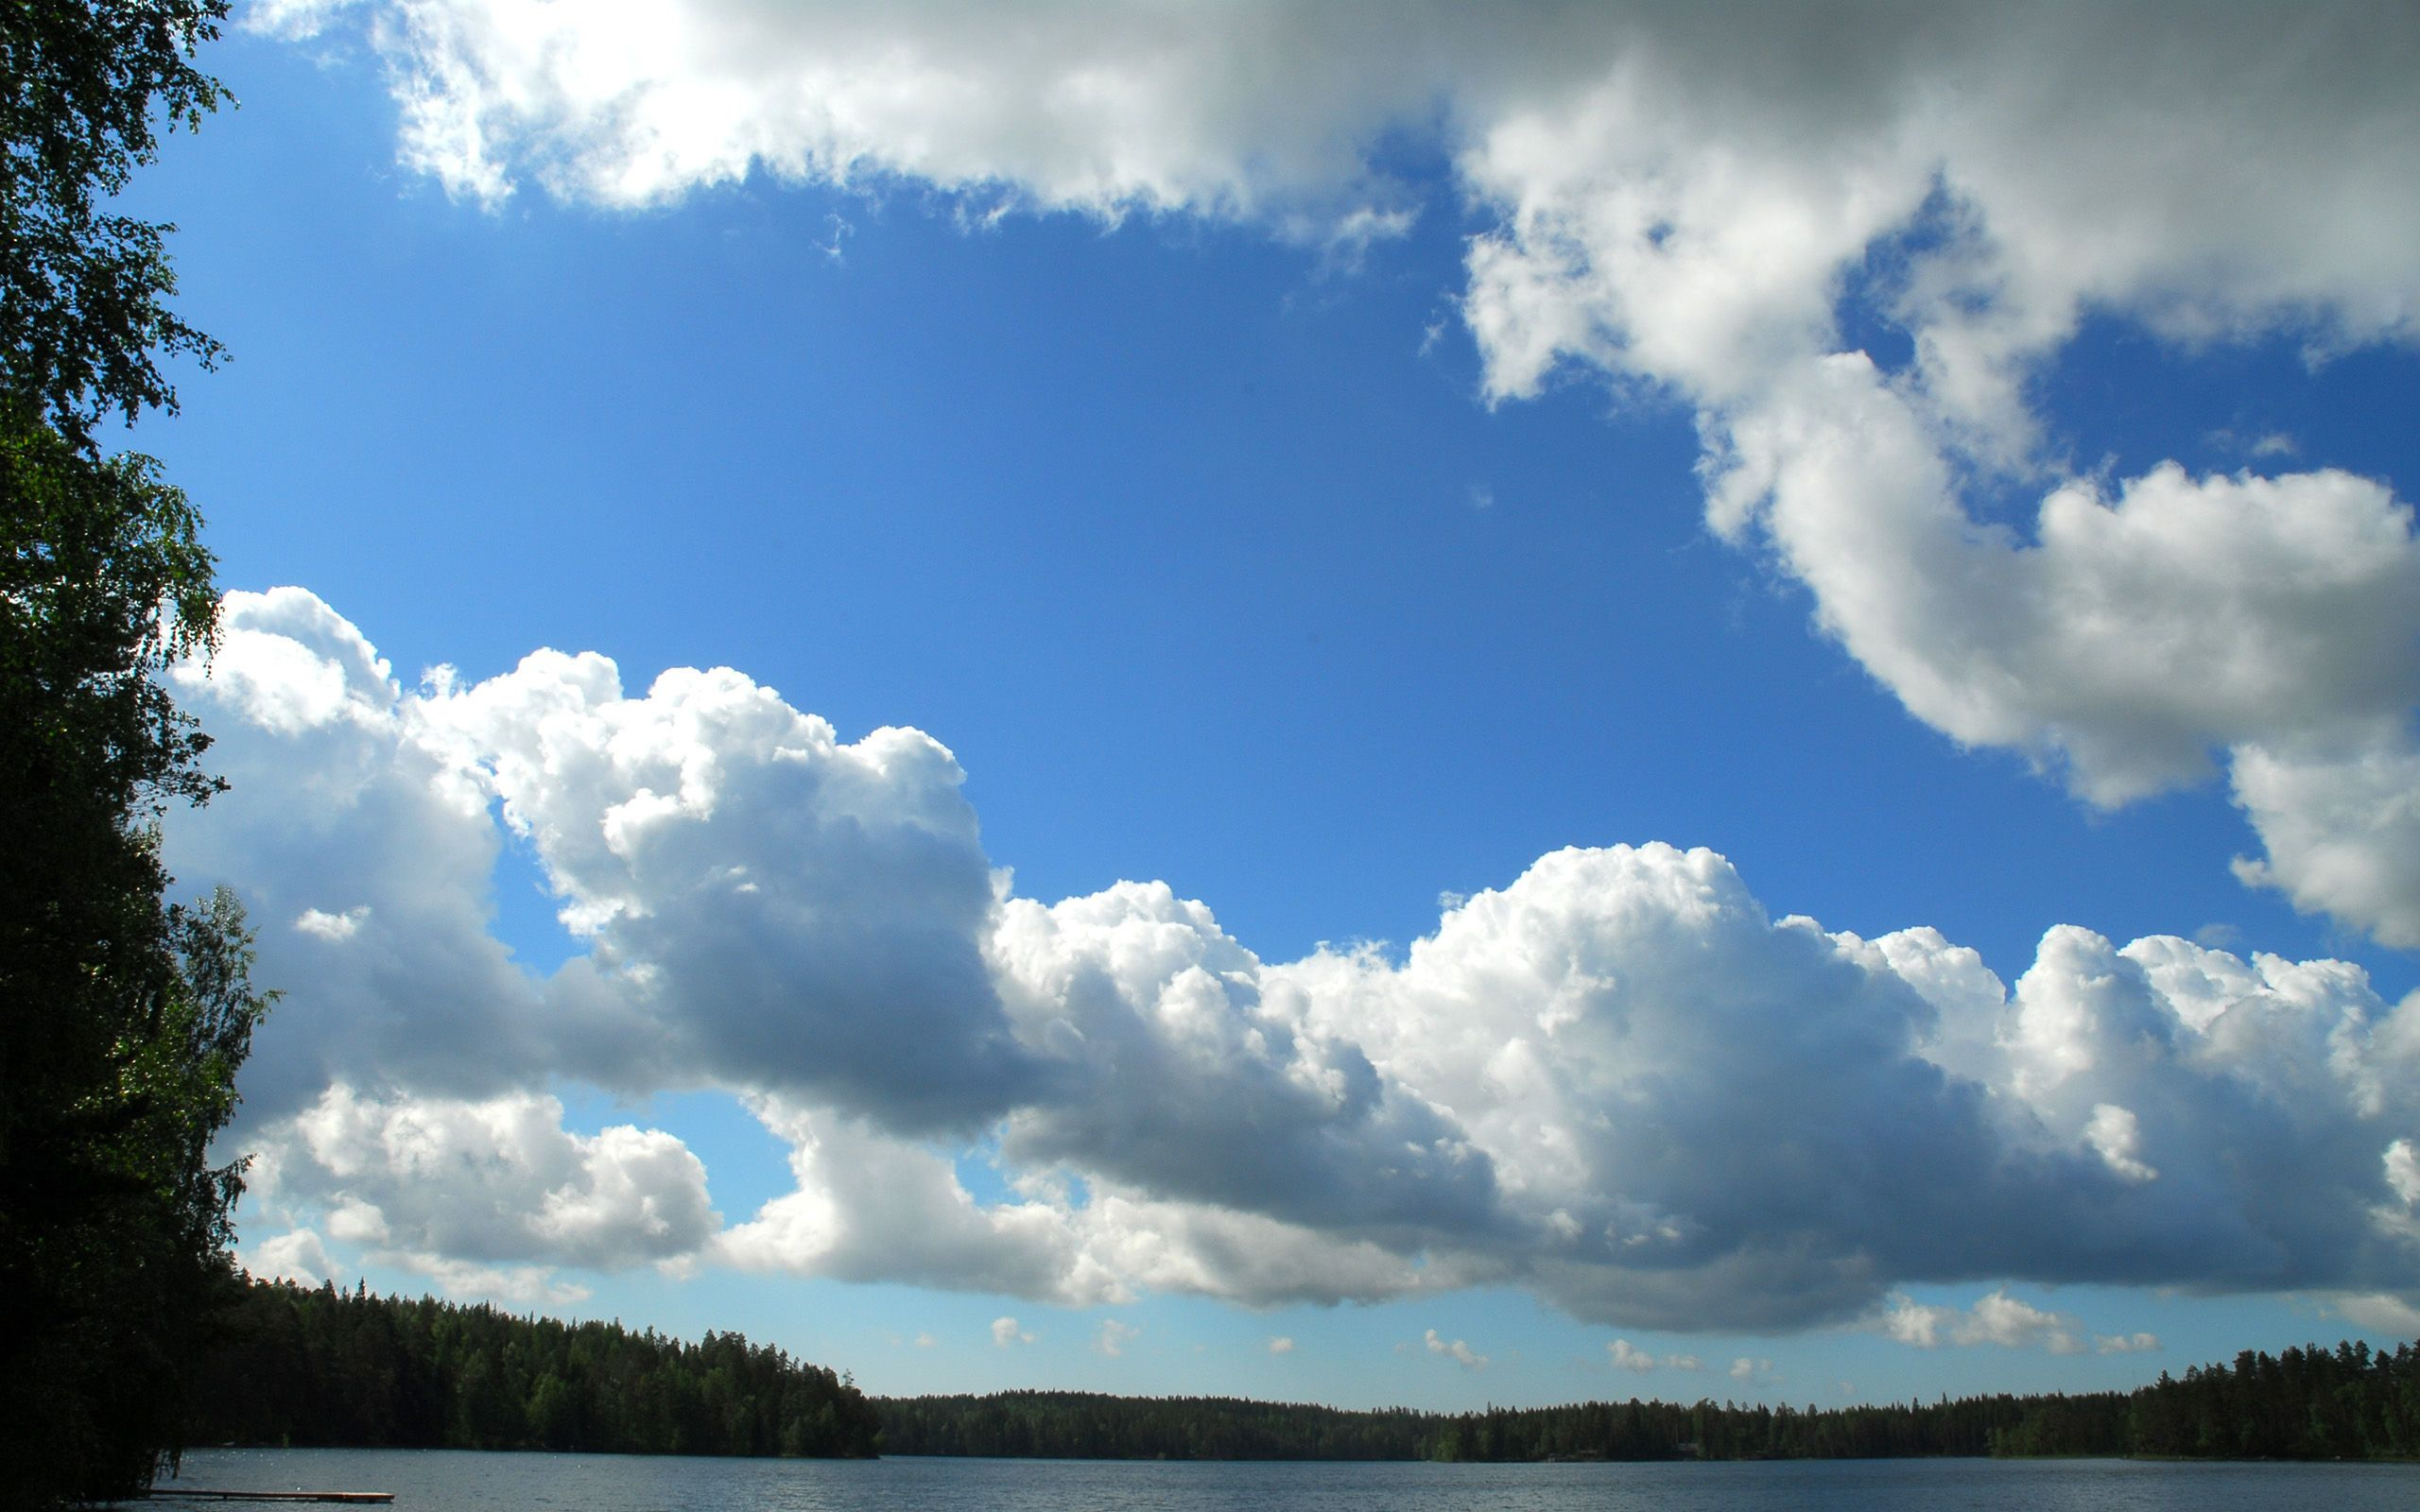 fond d ecran nuage - Page 3